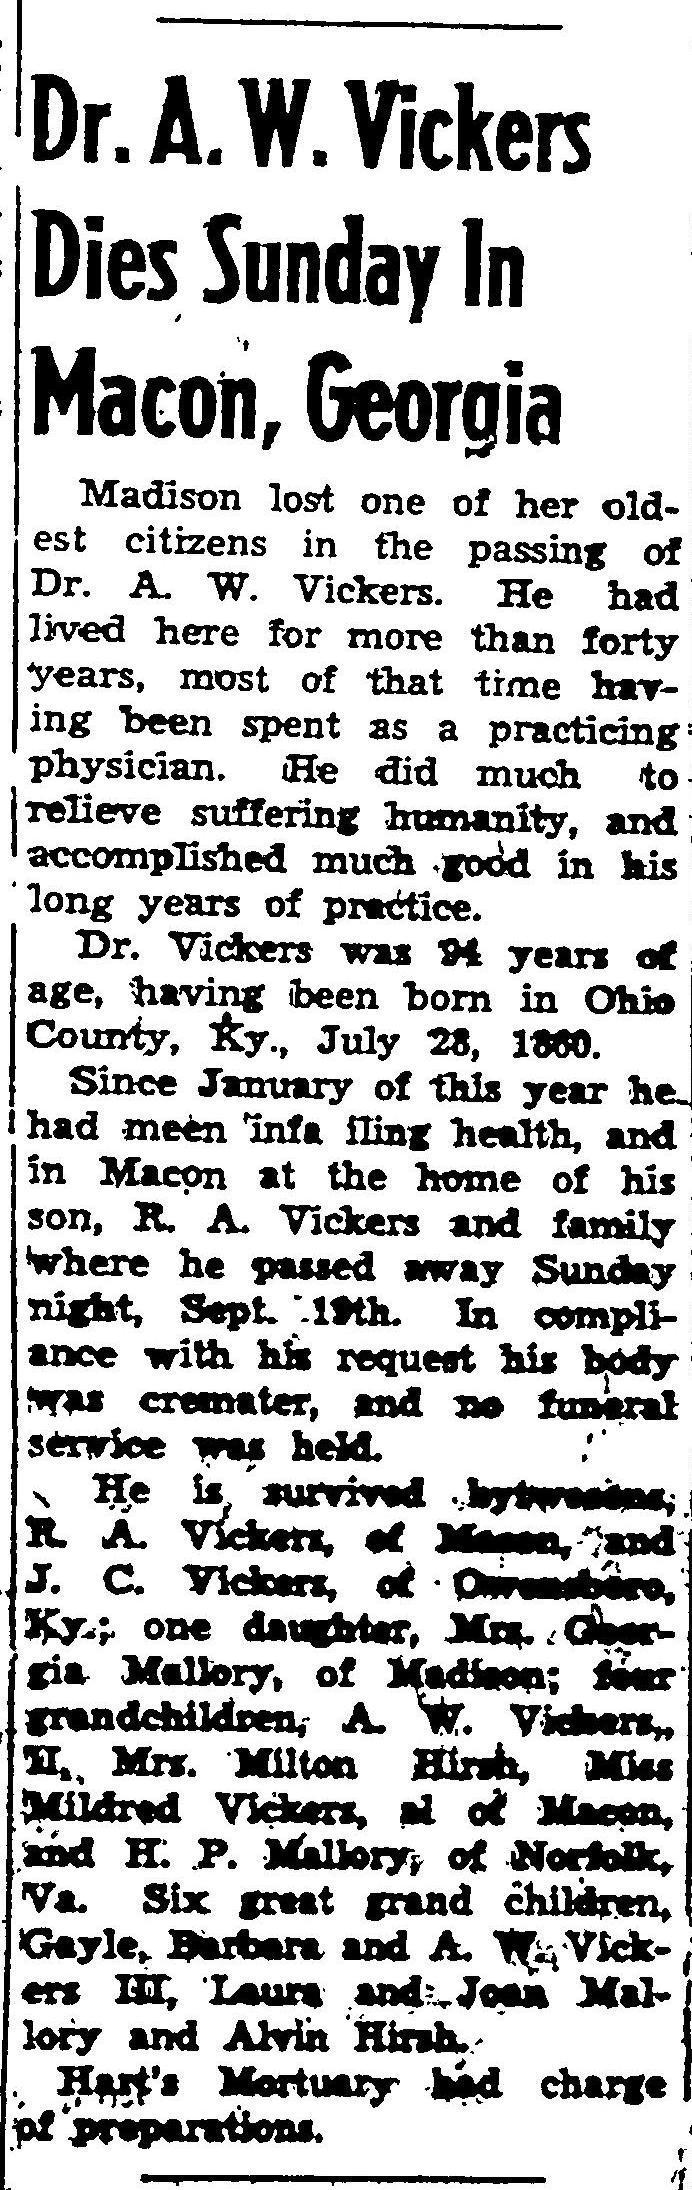 vickers_dralexanderw_1954-obituary.jpeg